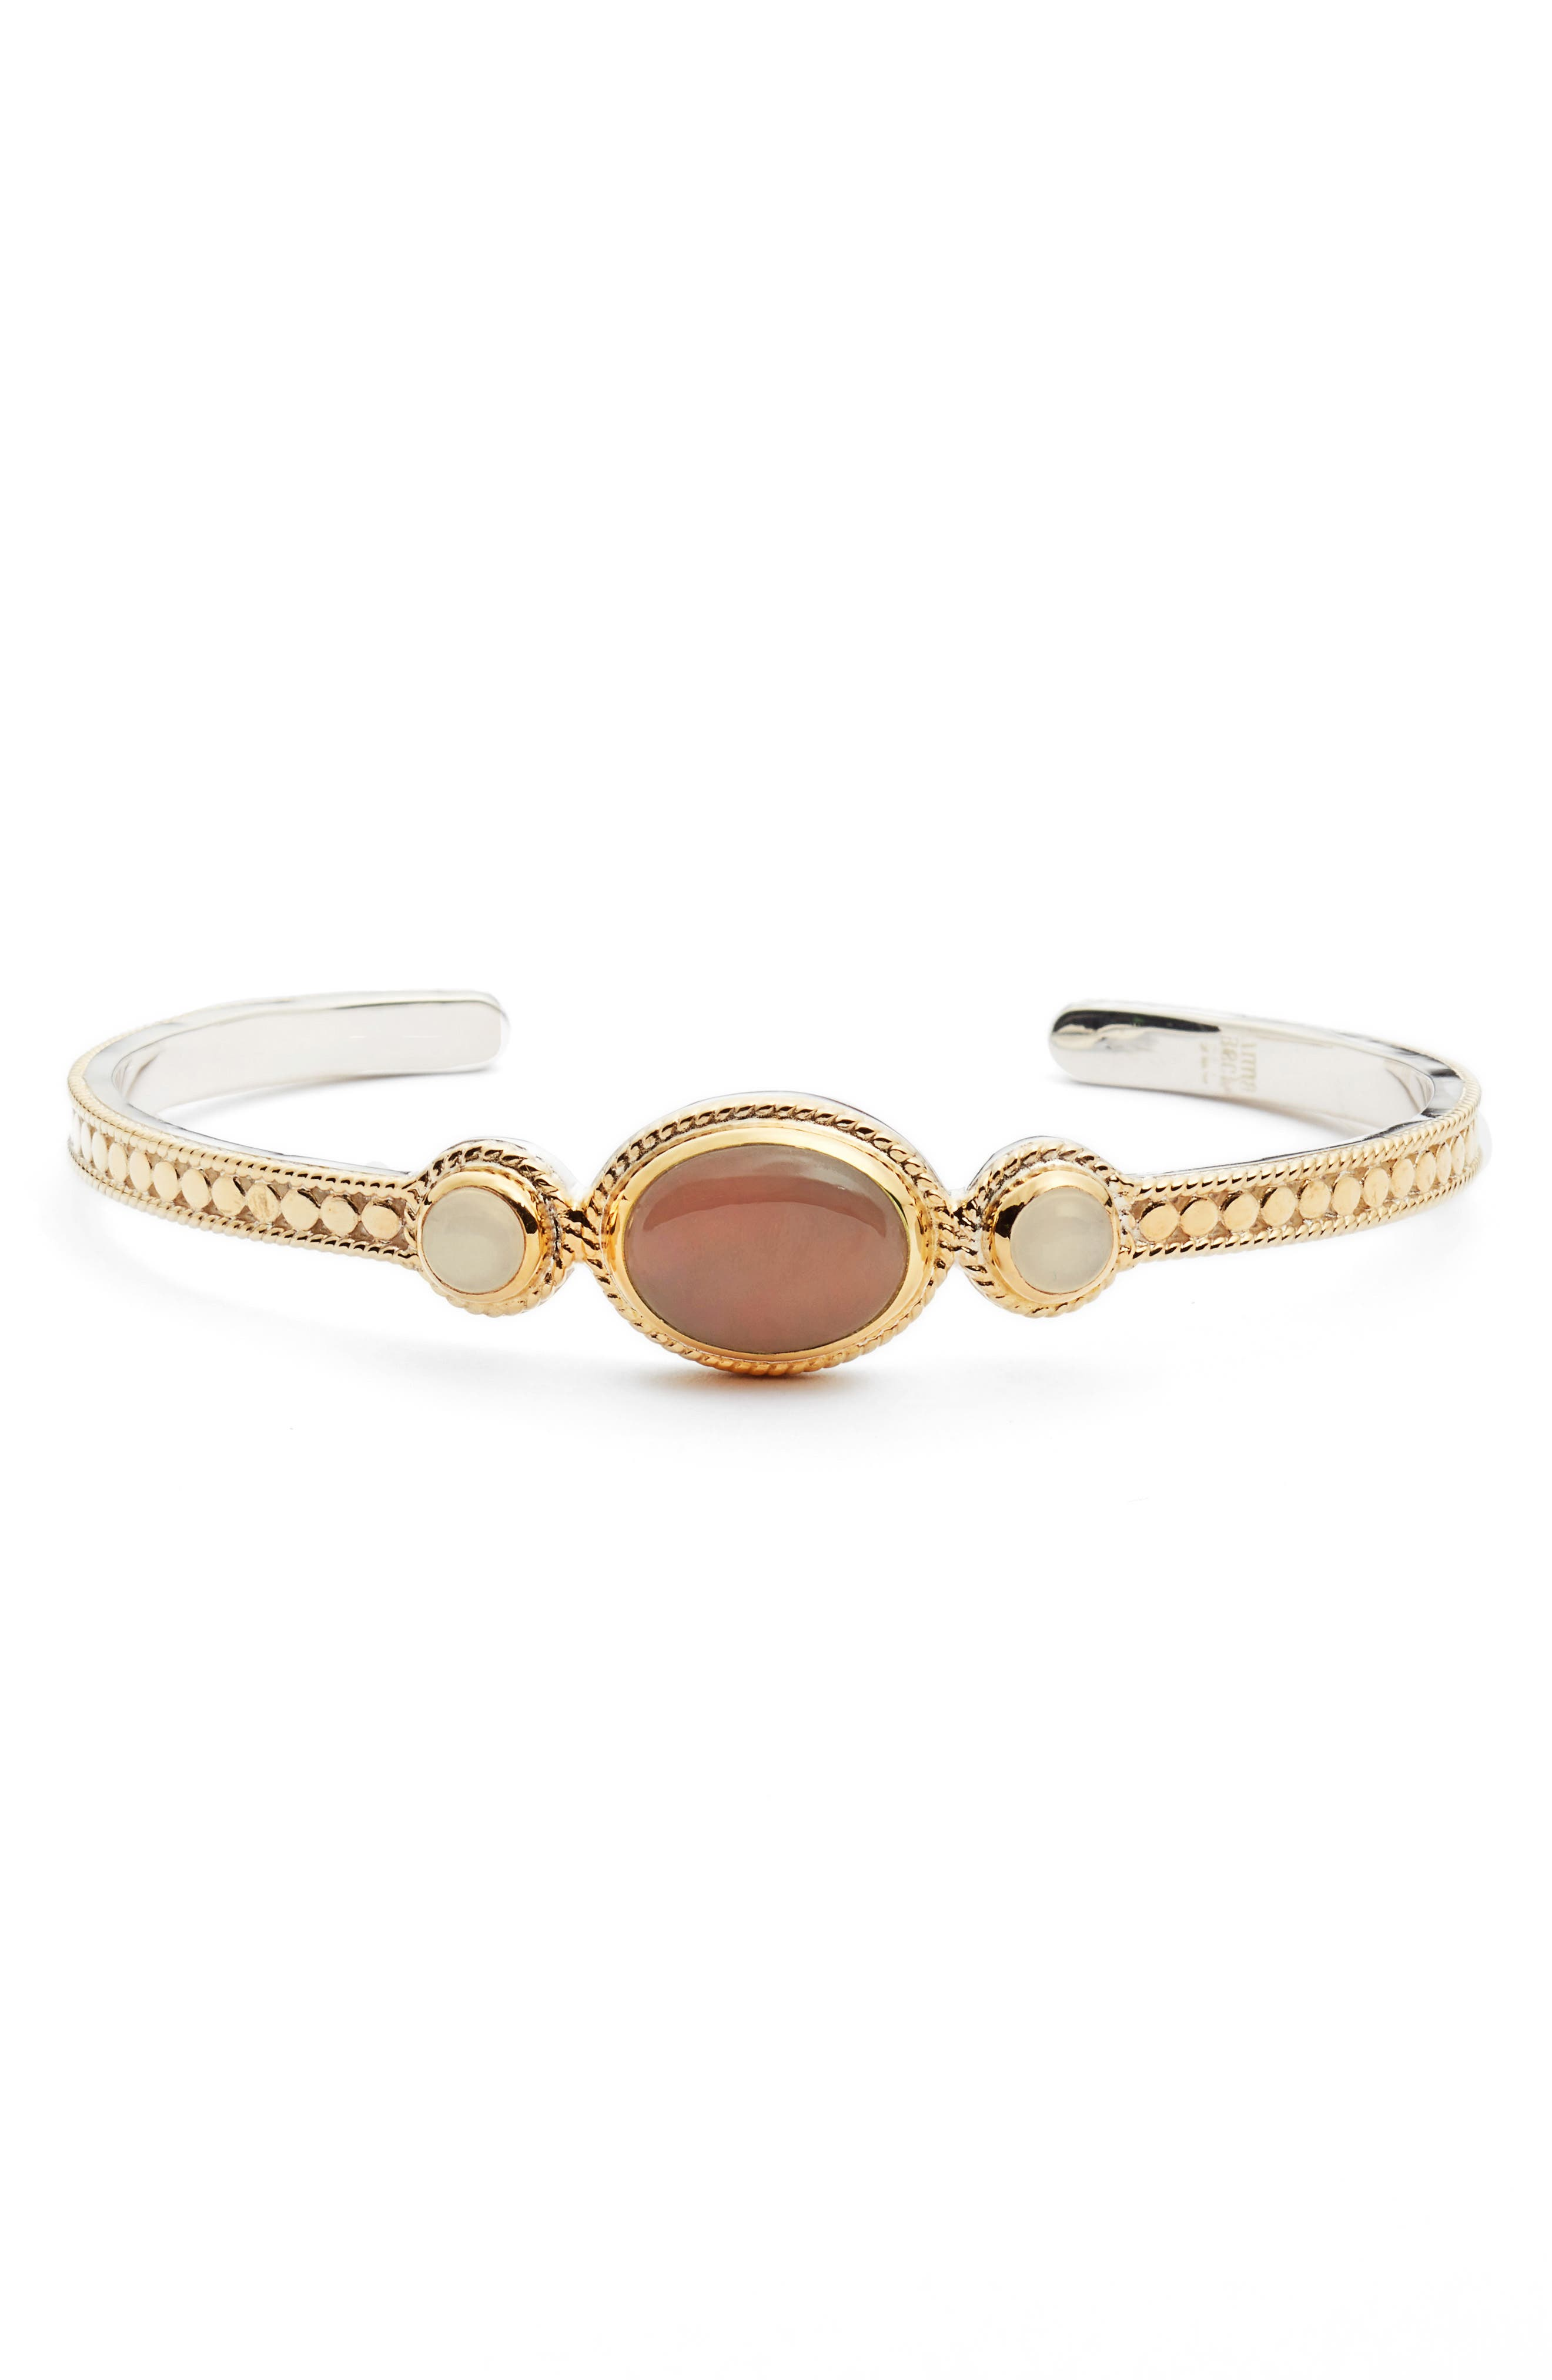 Guava Quartz & Moonstone Cuff Bracelet,                             Main thumbnail 1, color,                             950